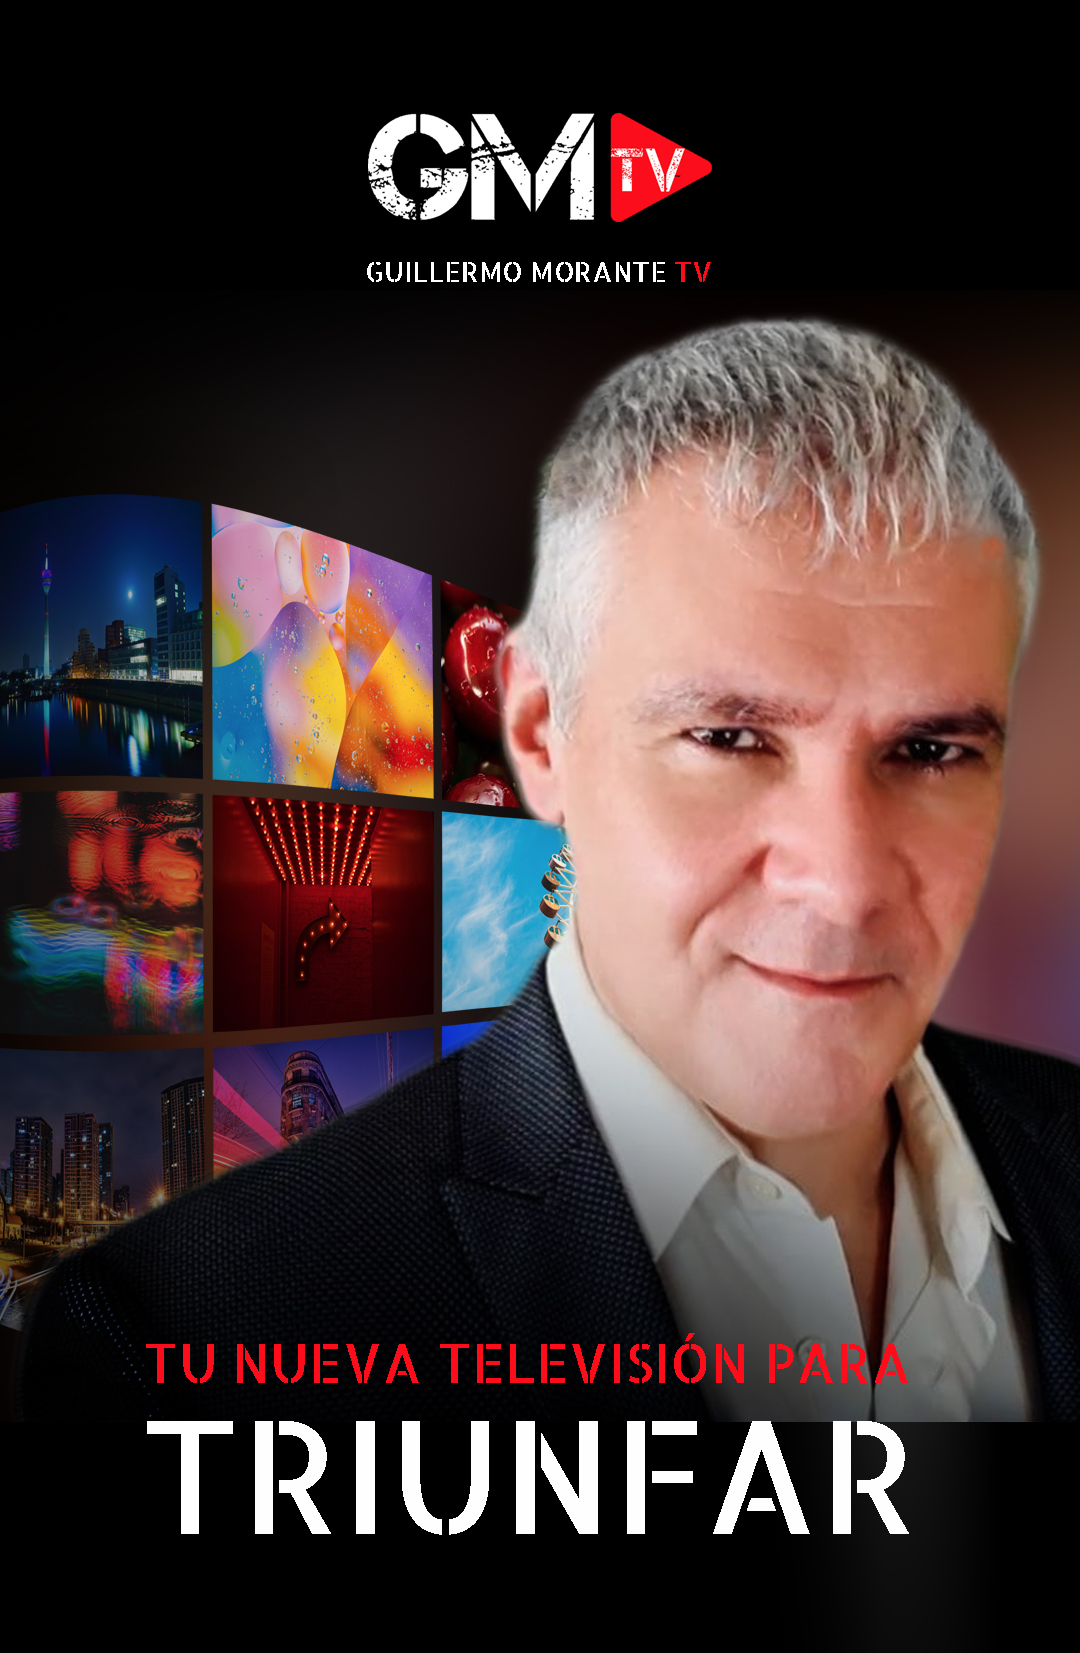 Guillermo Morante TV móvil